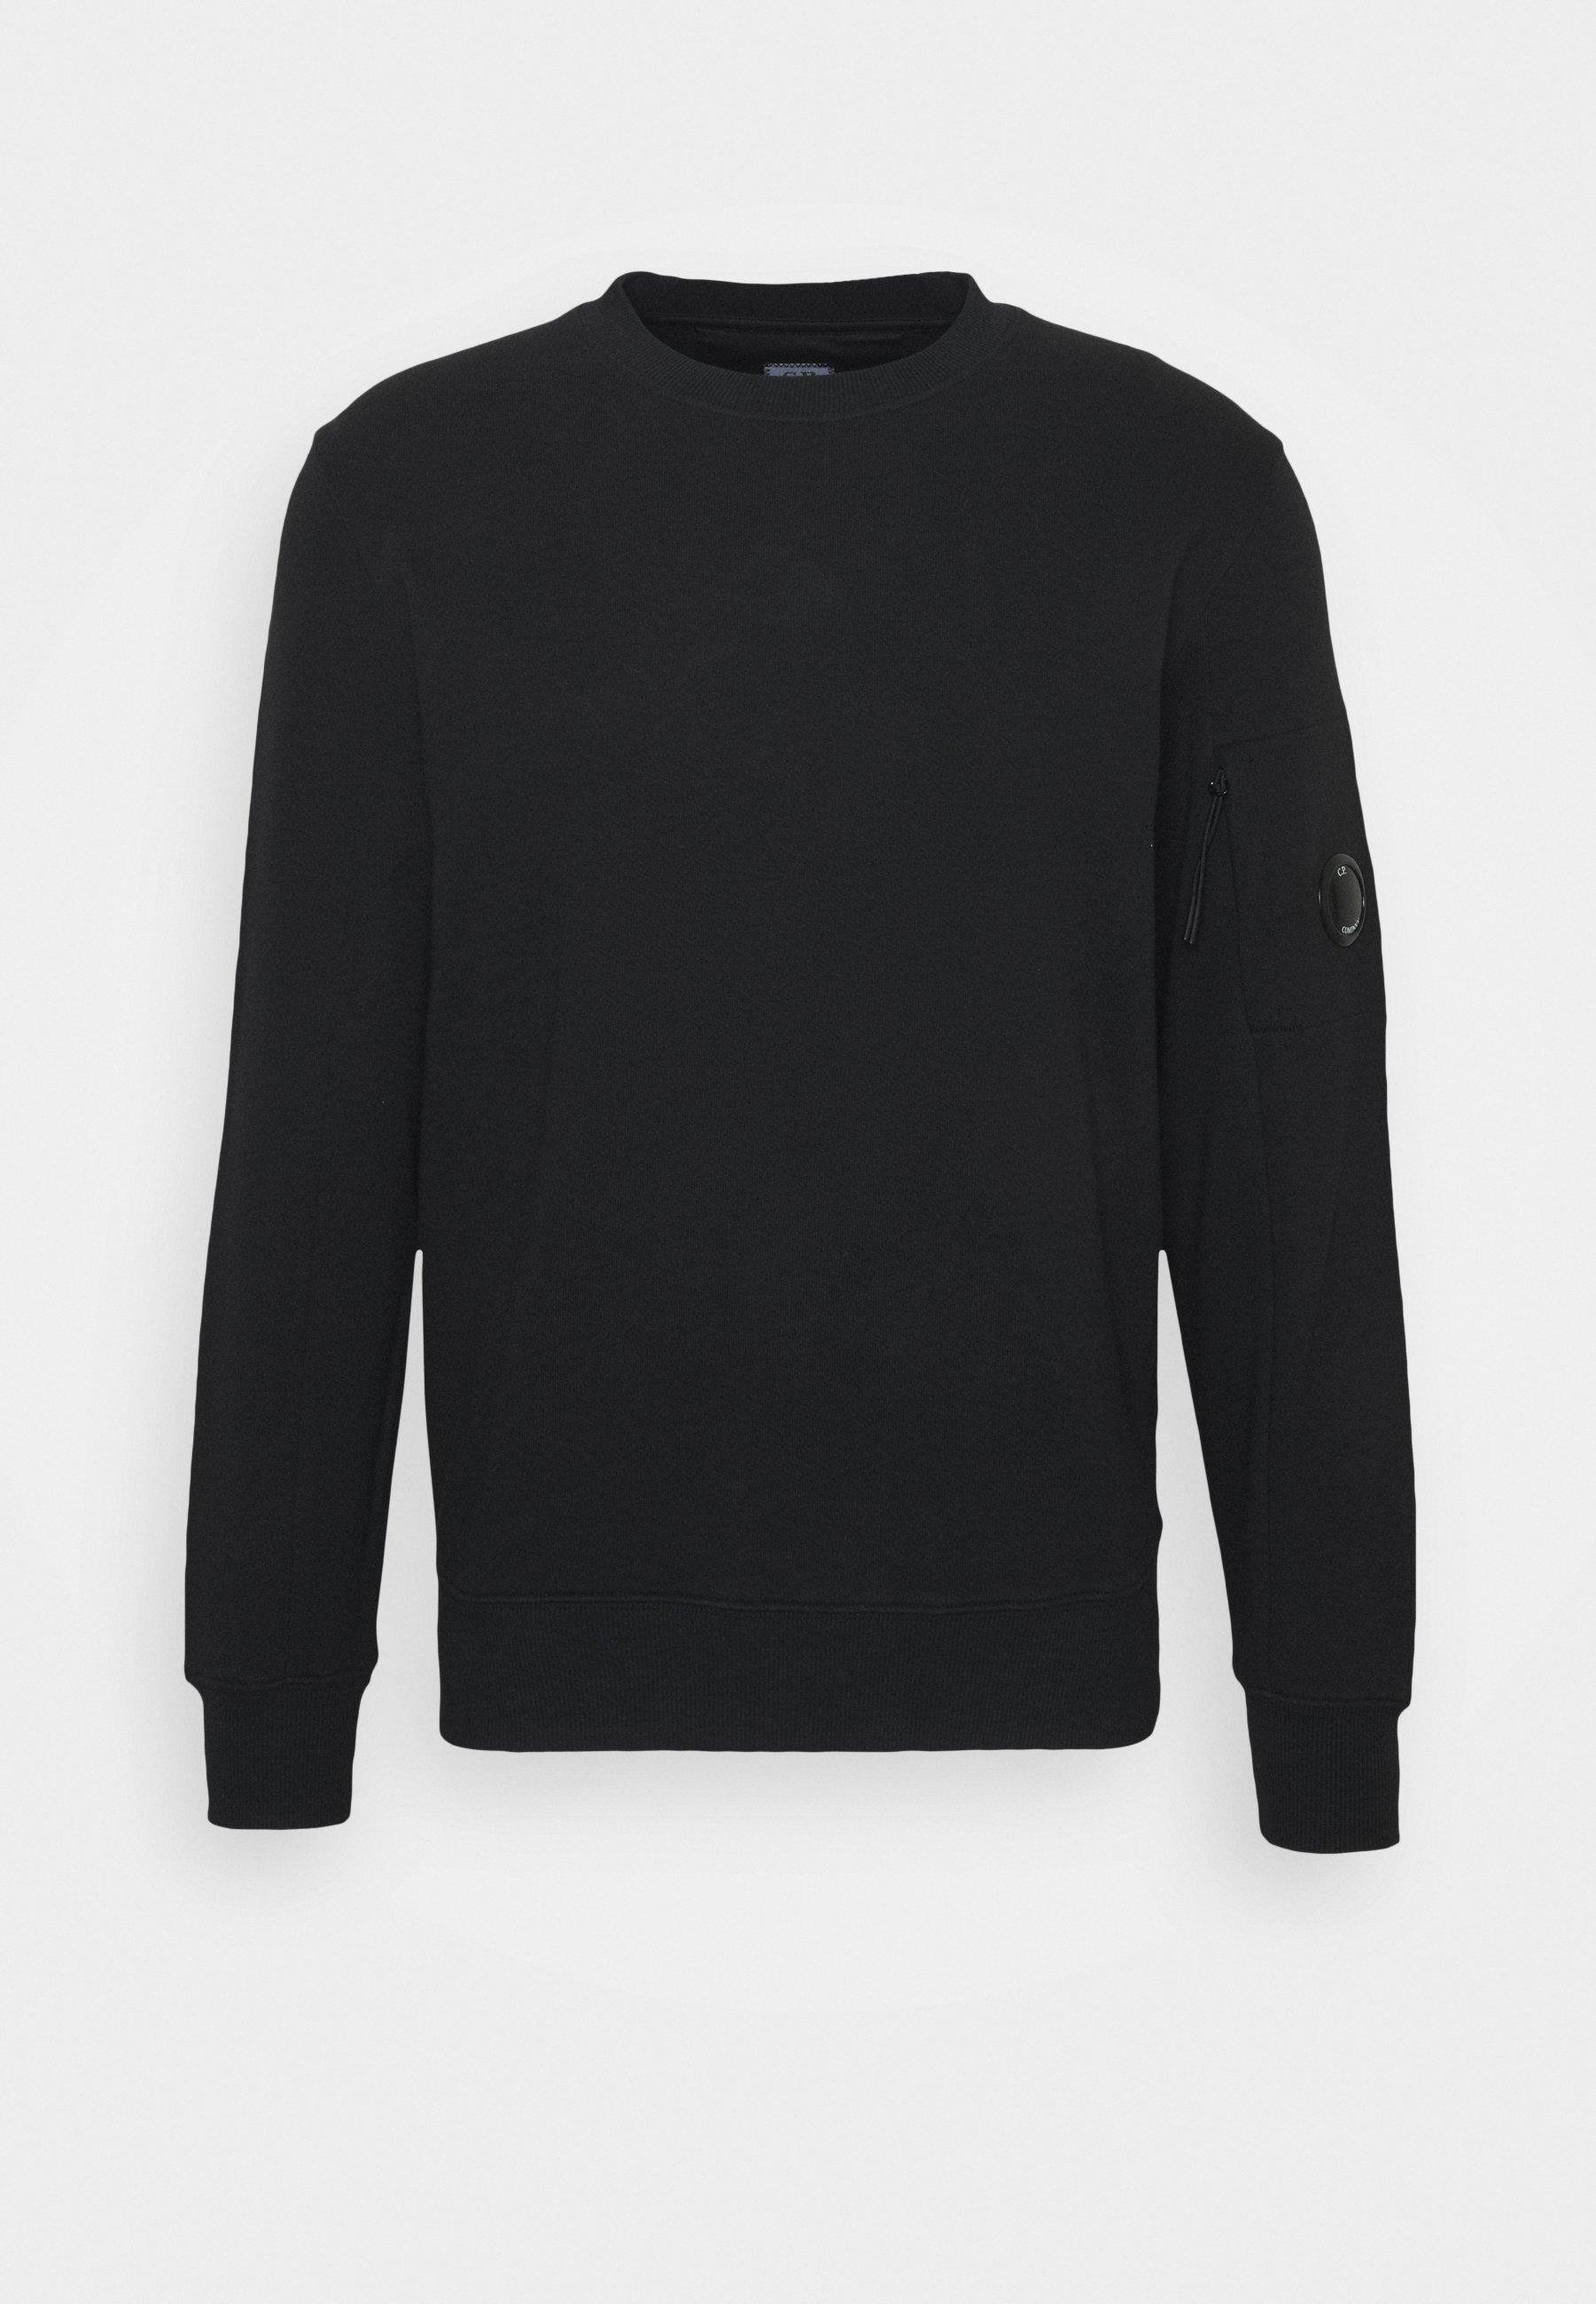 BLACK CREW NECK SWEATER | C.P. Company | Truien & Vesten